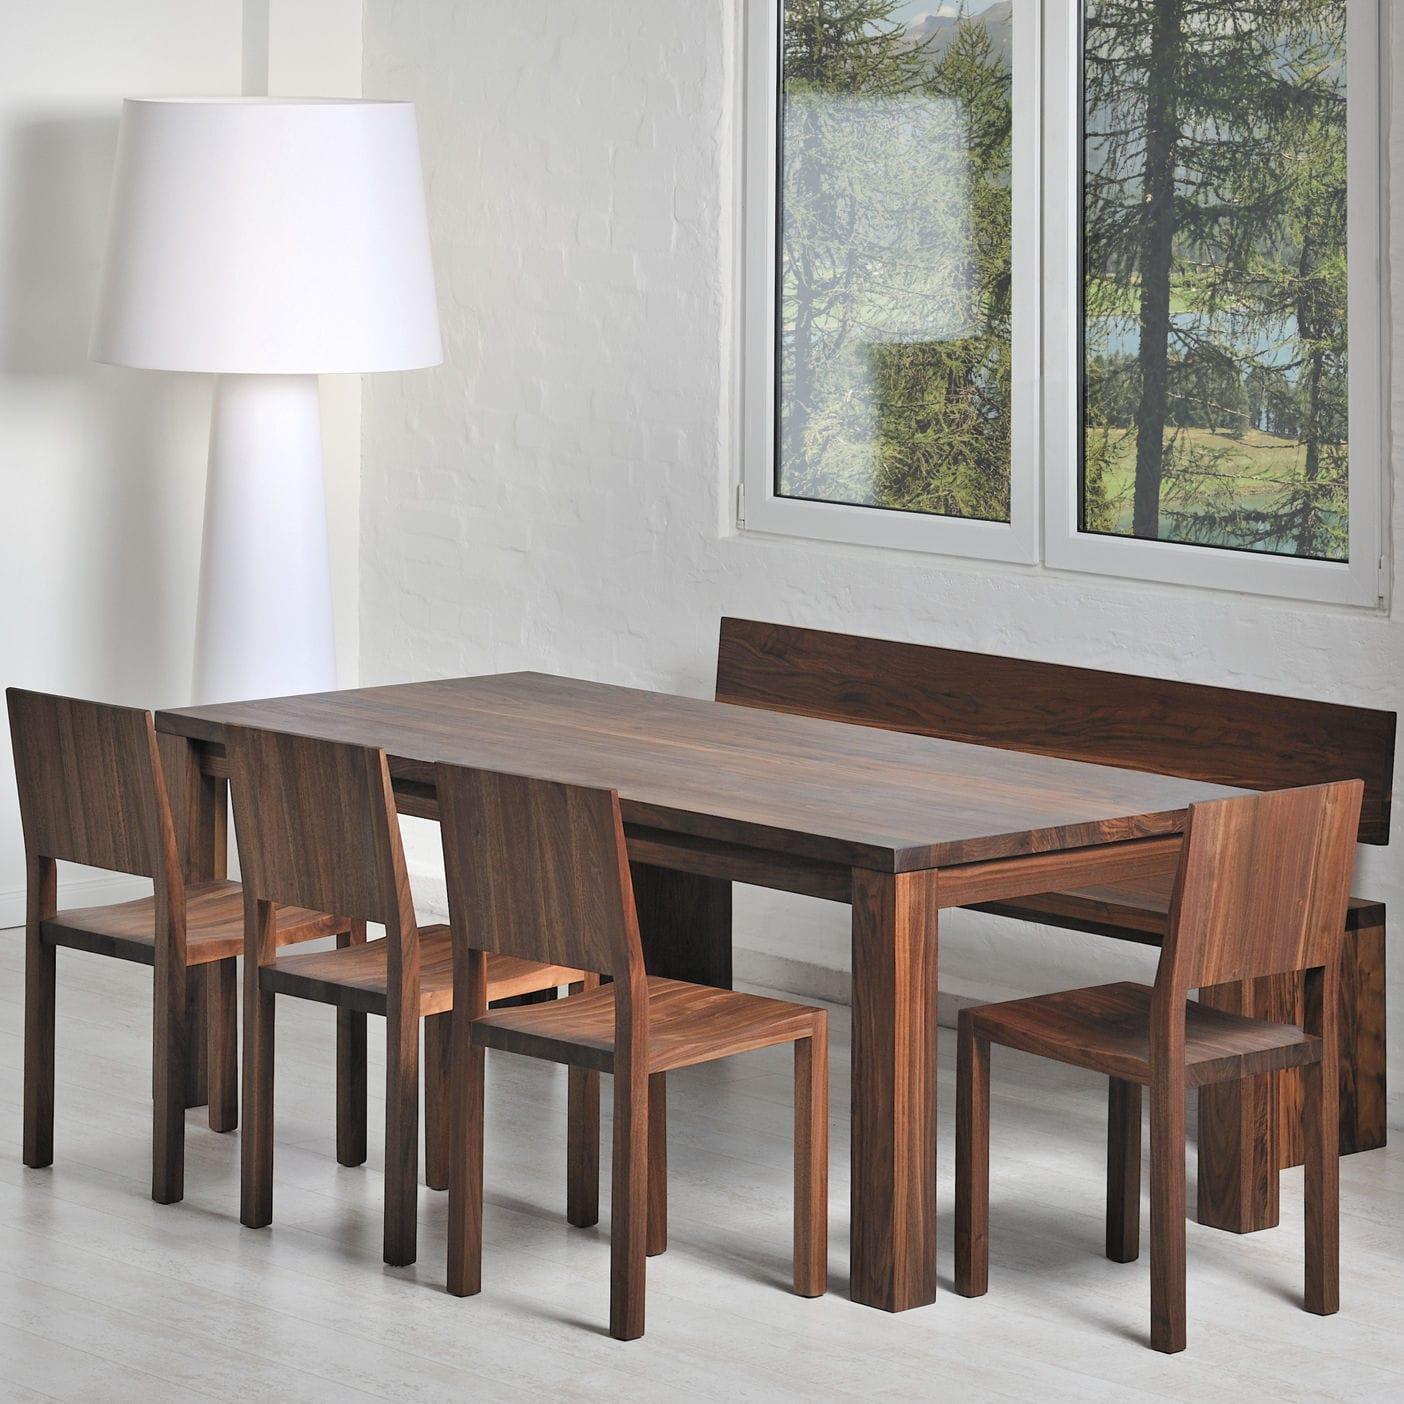 Scandinavian Design Dining Table Oak Walnut Solid Wood Cubus